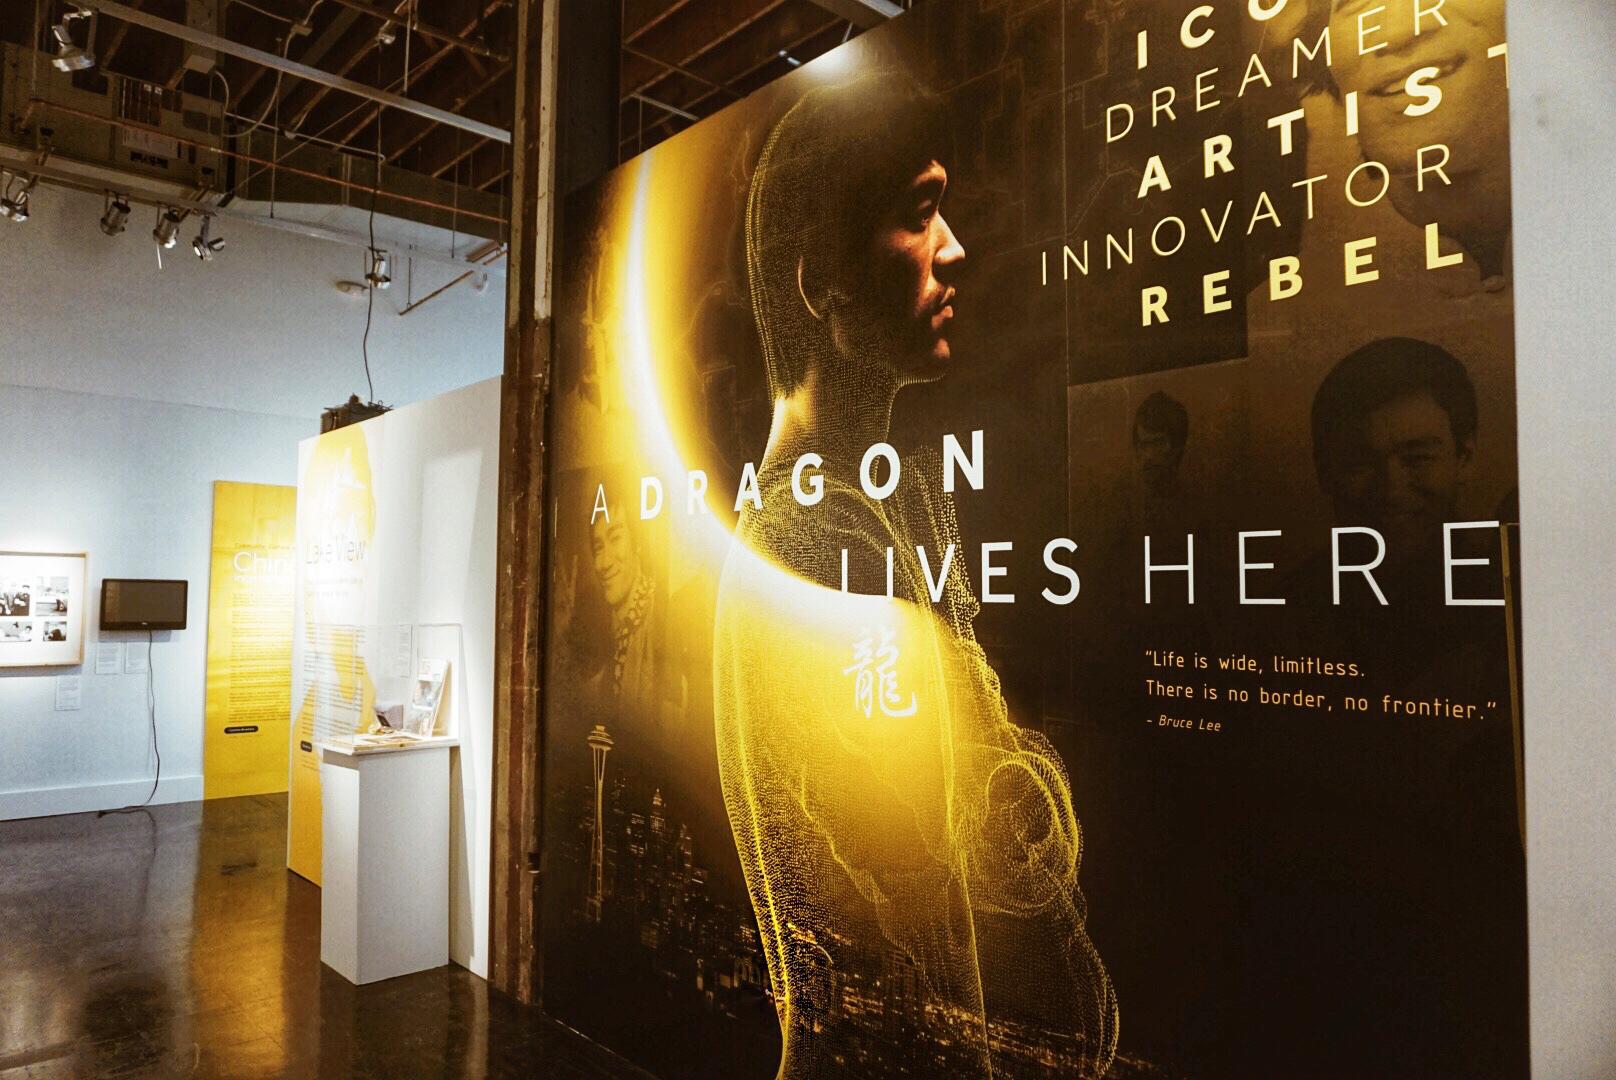 A Dragon Lives Here Bruce Lee 1.jpg